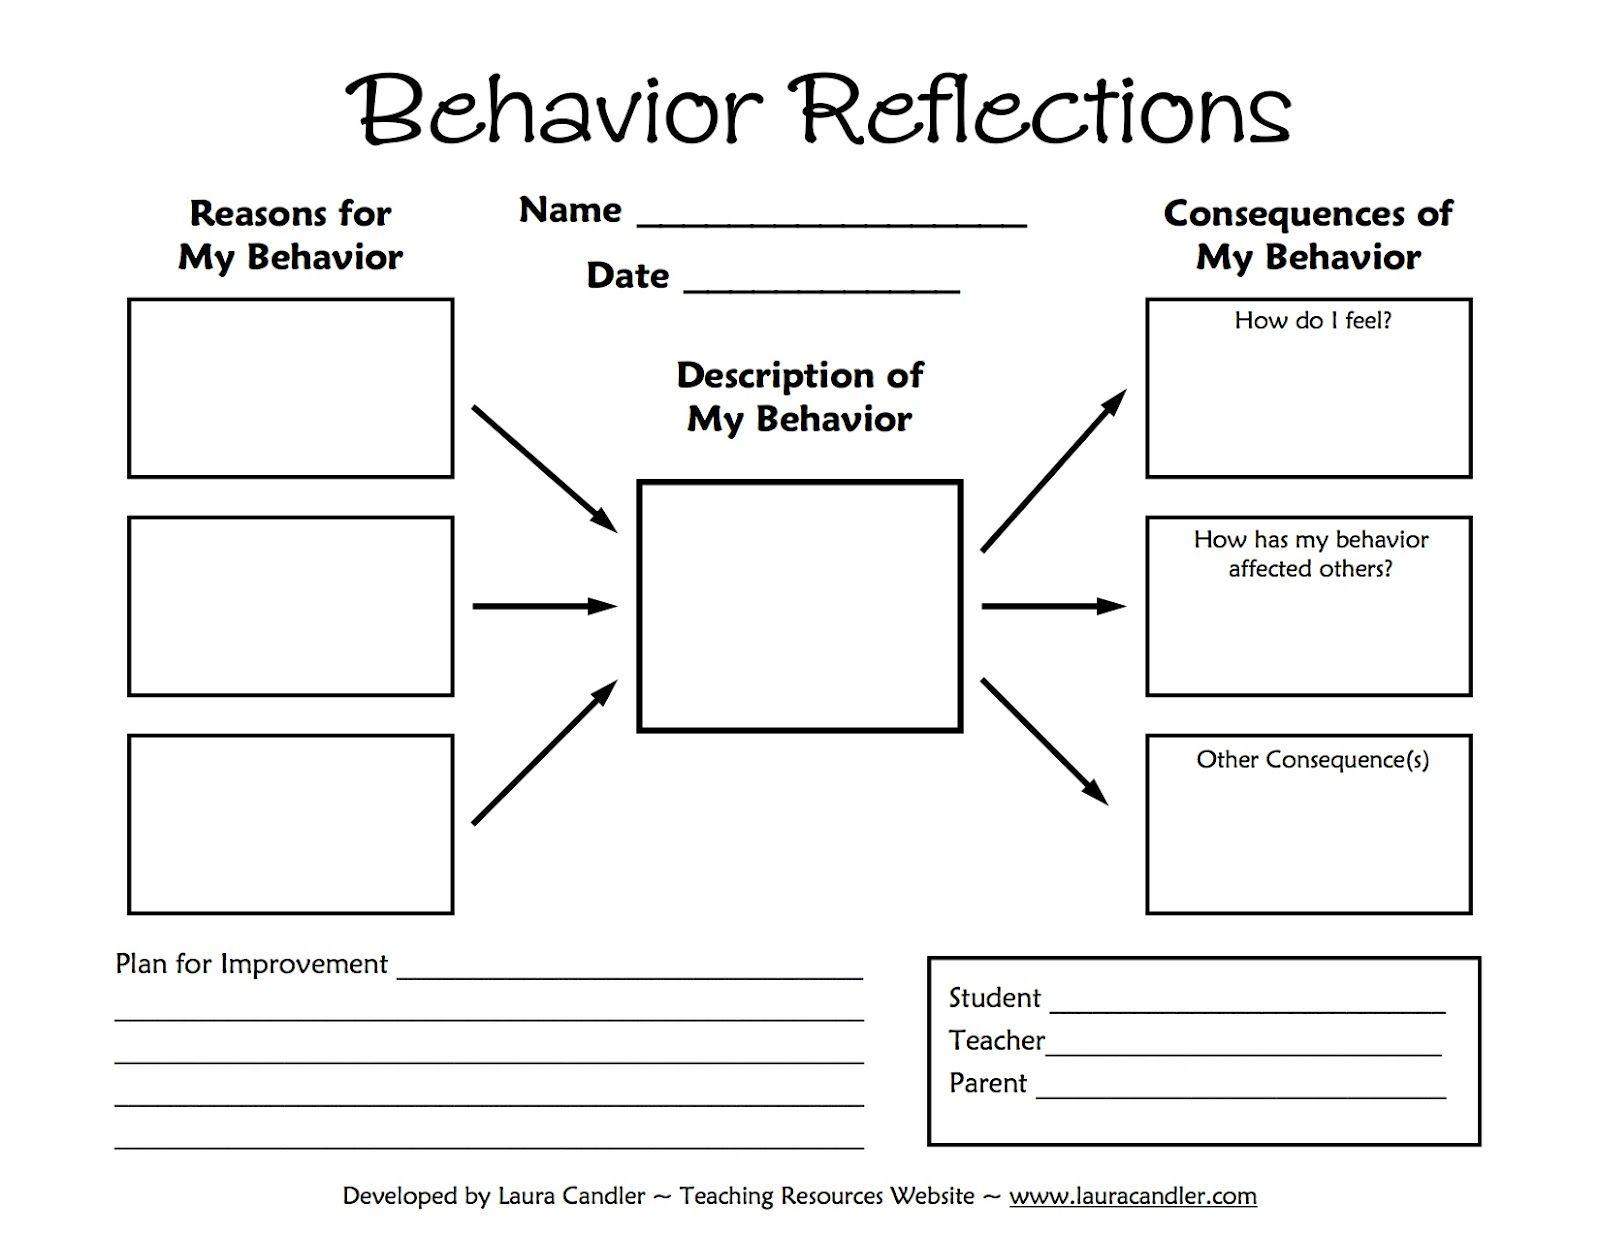 Tween Teaching: Behavior Reflections Sheet | School | Behavior | Middle School Printable Worksheets